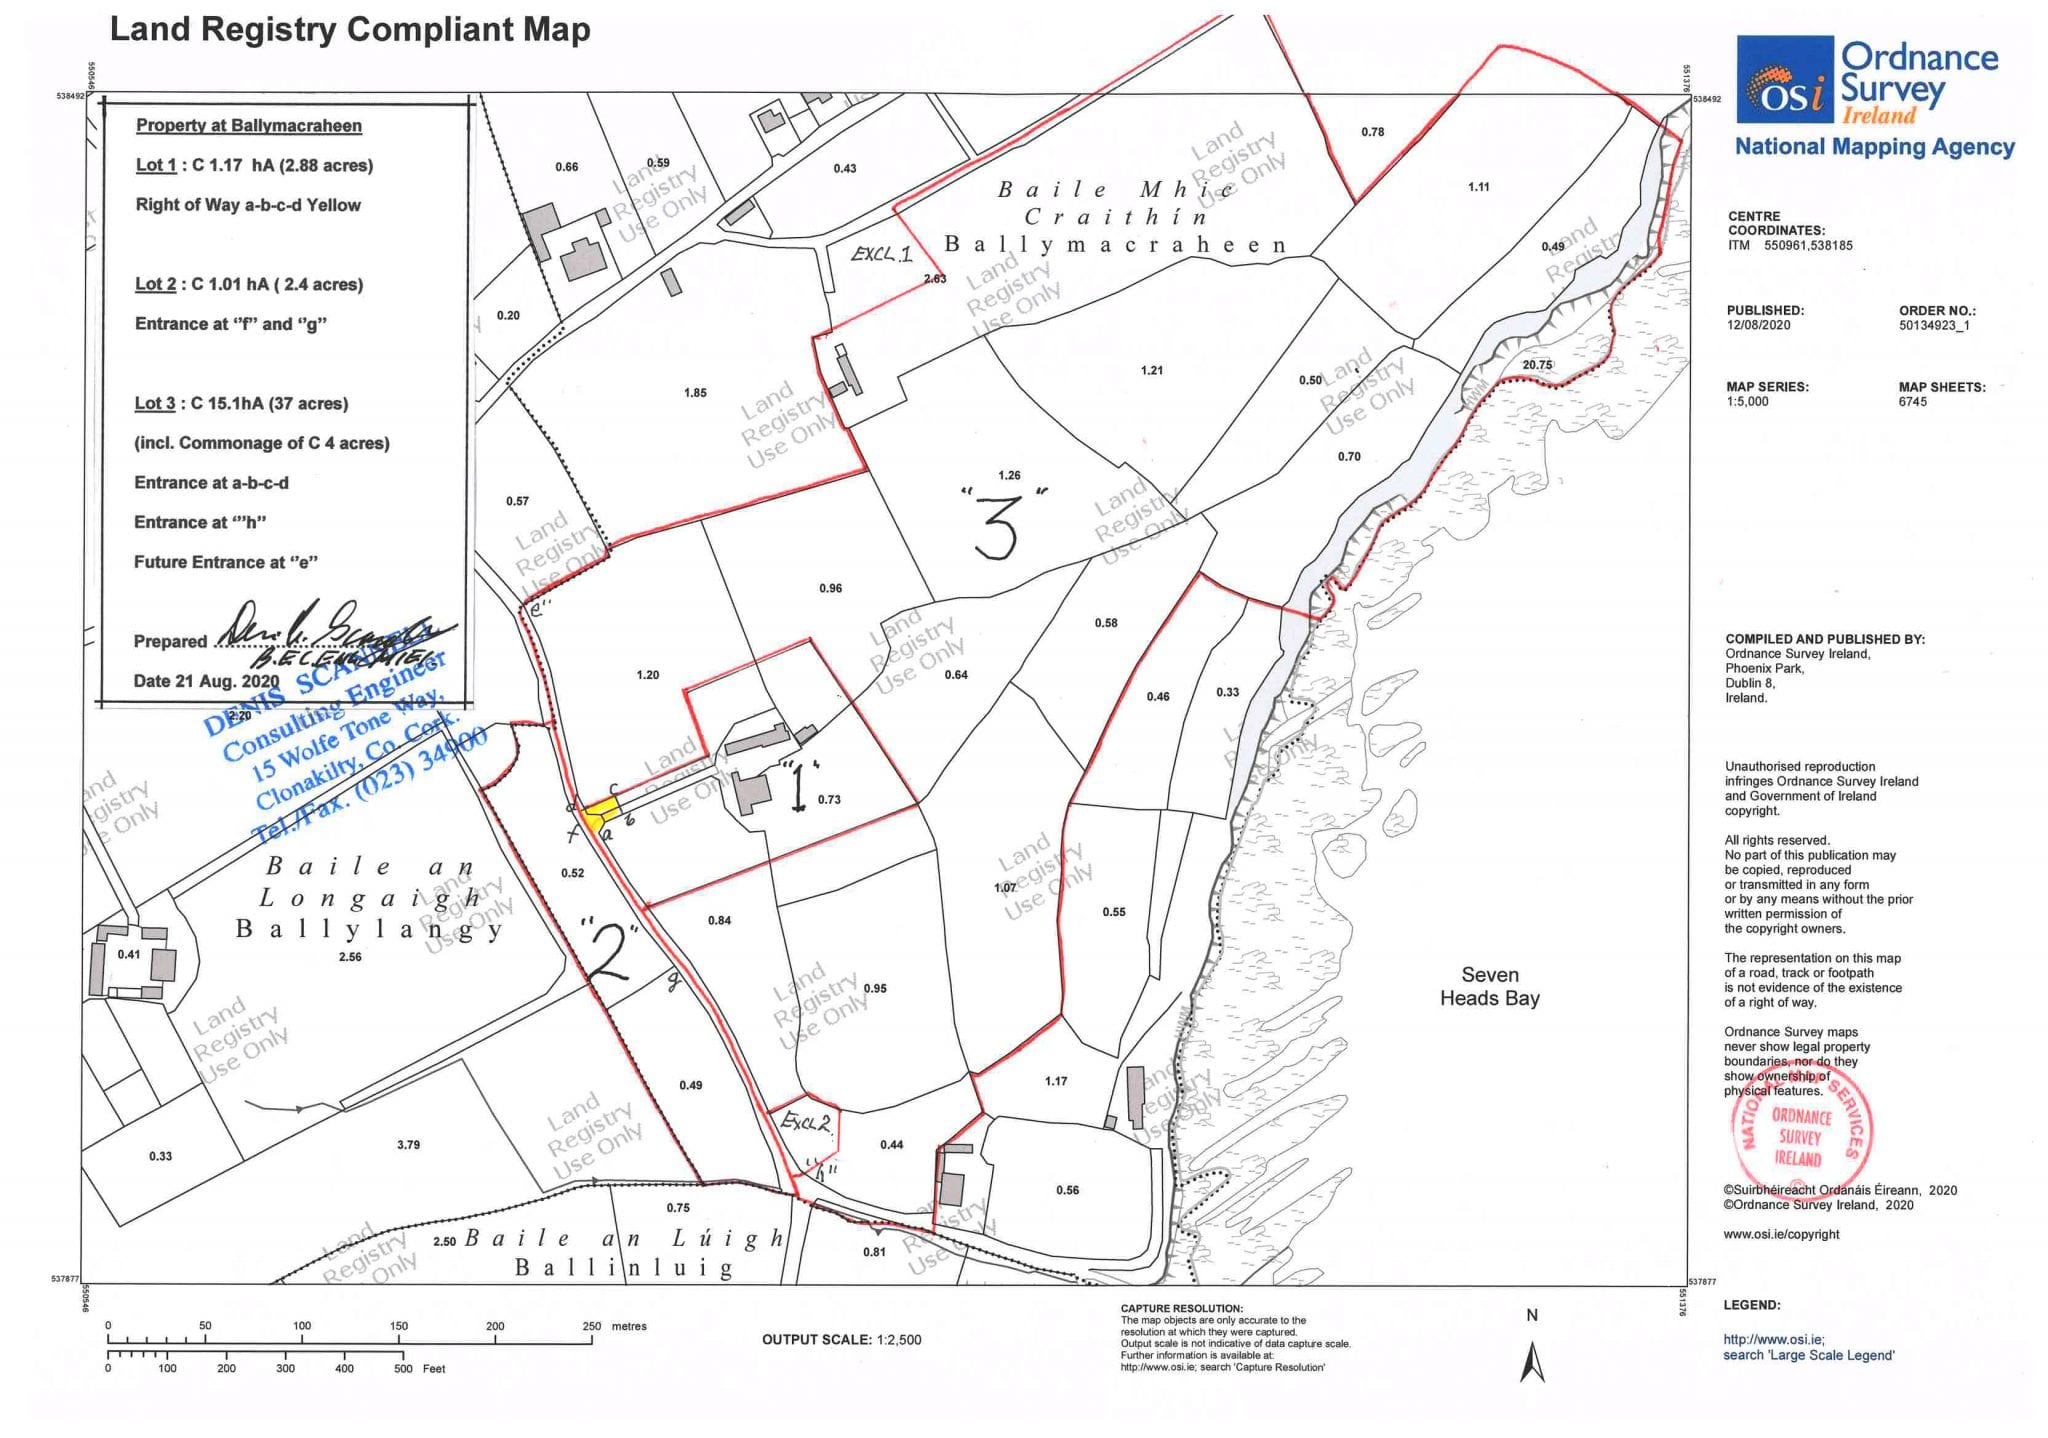 Engineer's map